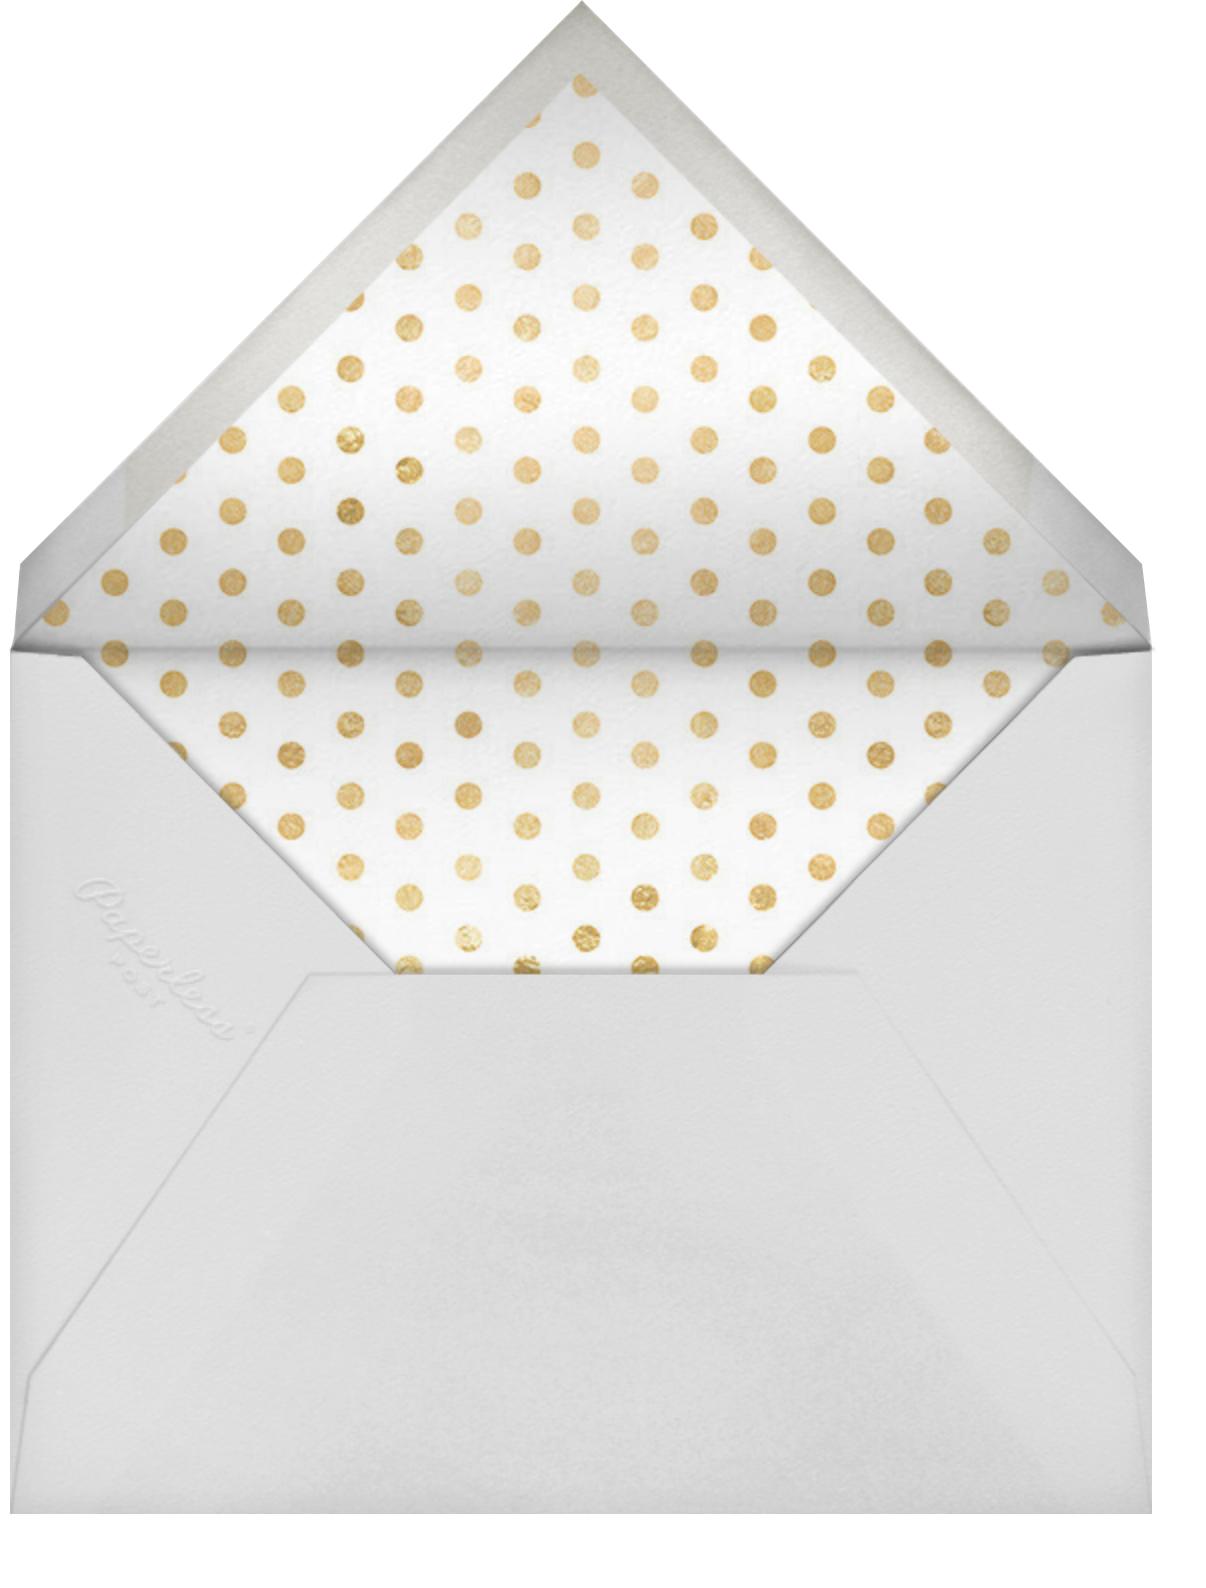 Monarch Birthday - Rifle Paper Co. - Envelope